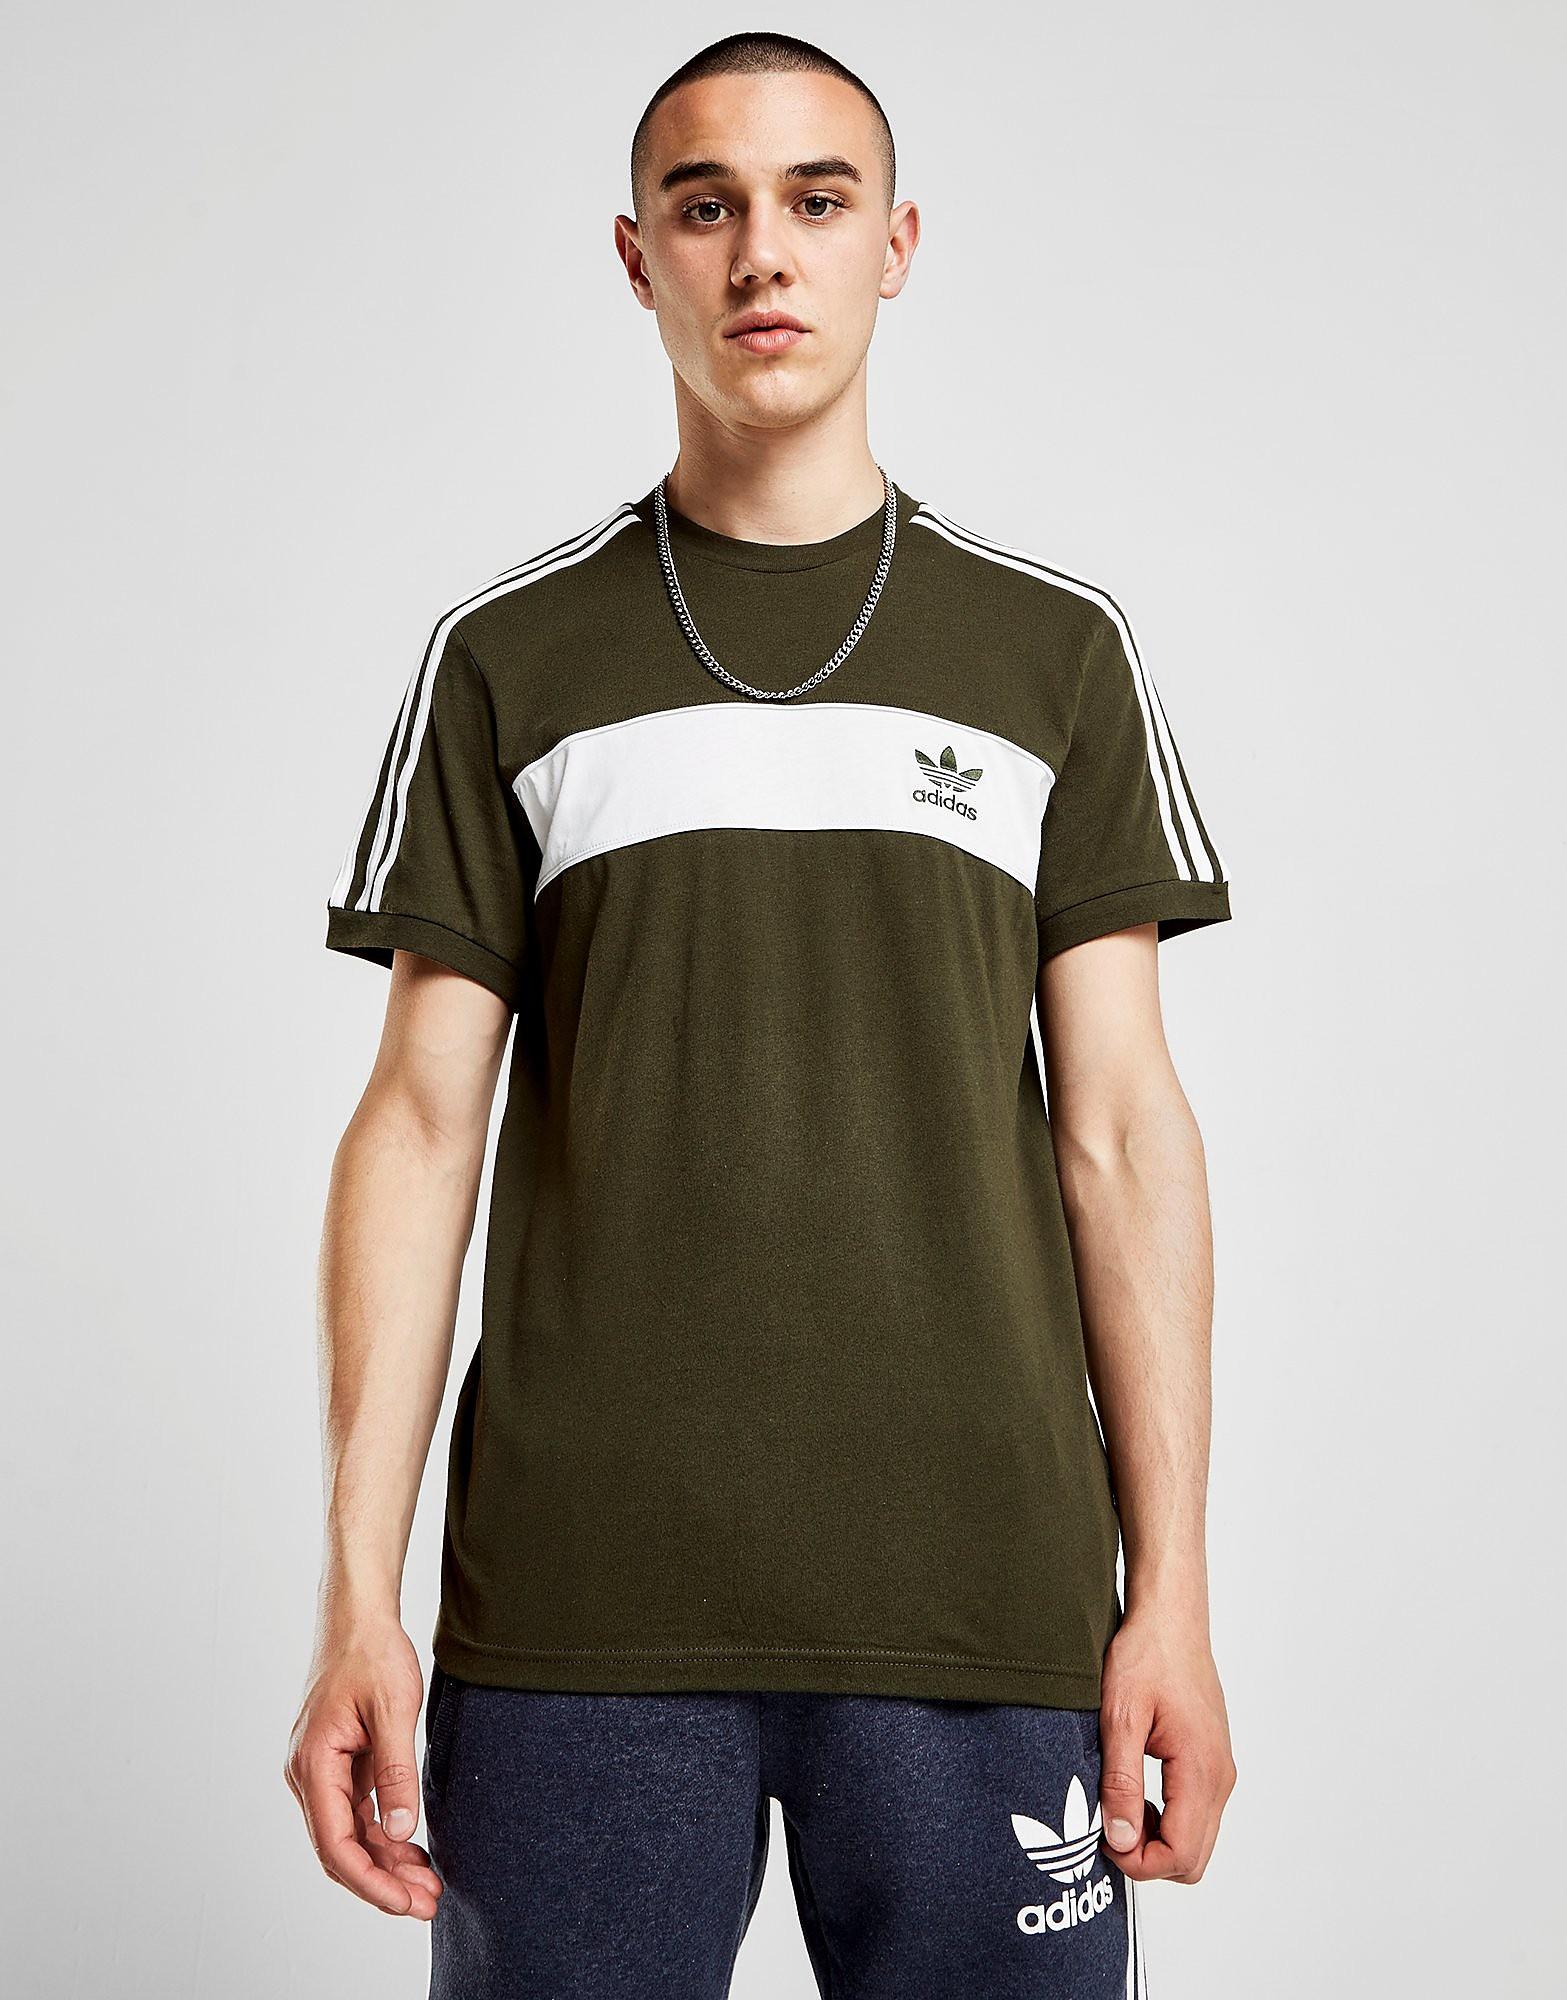 adidas Originals Hamburg T-Shirt